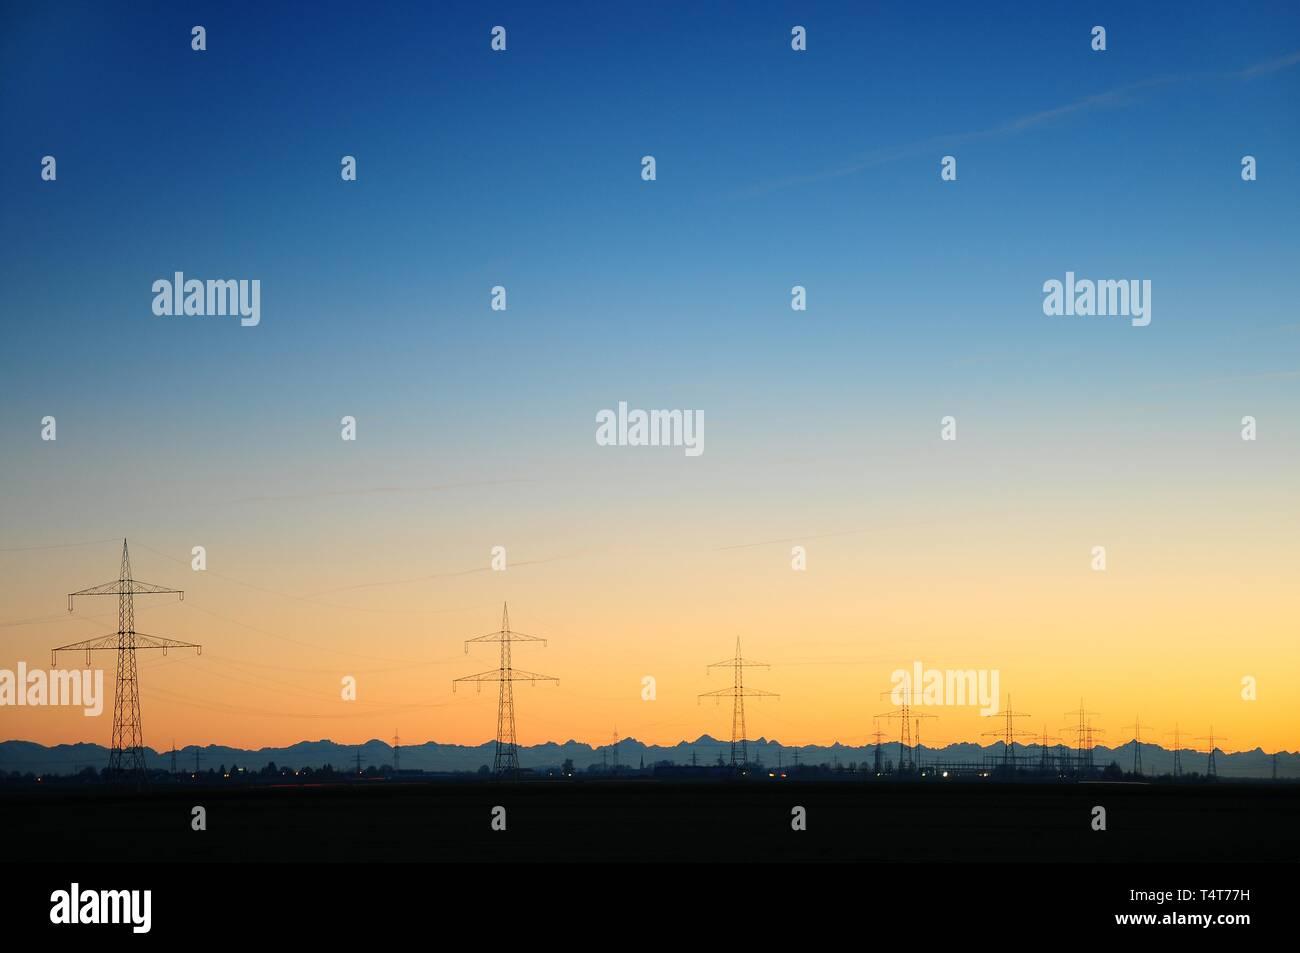 Sunset, powerlines, Alps in Lechfeld in Bobingen, Swabia, Bavaria, Germany, Europe - Stock Image